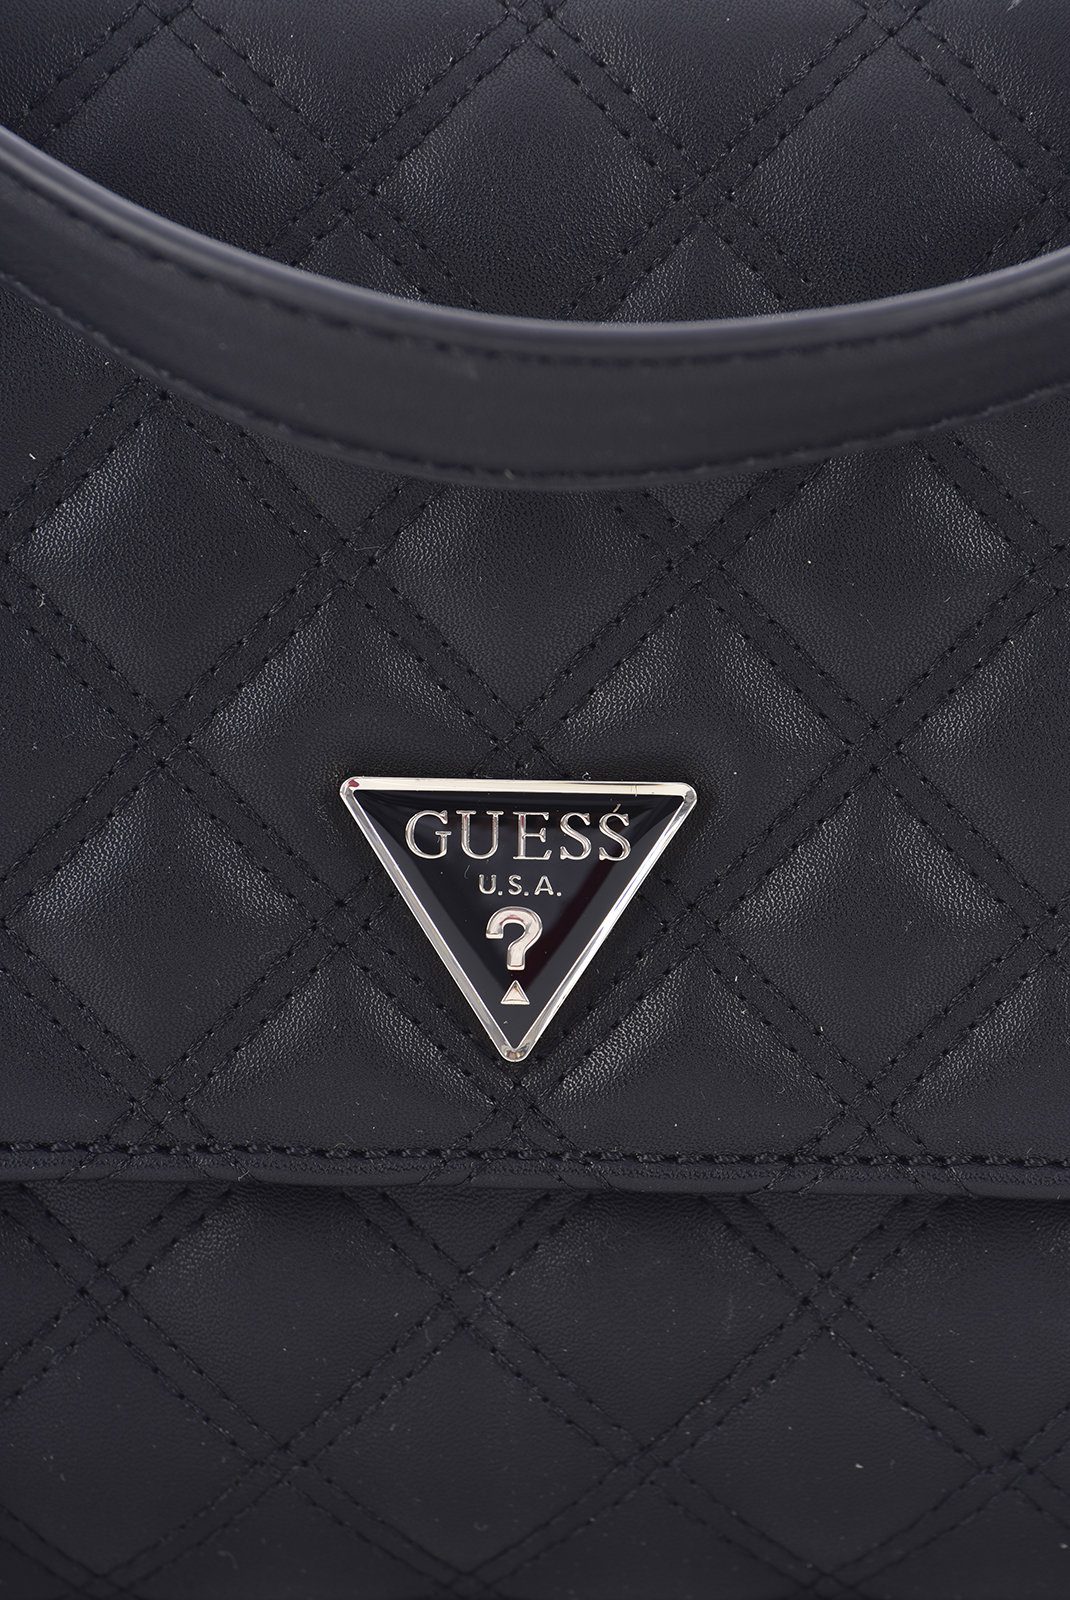 Guess jeans HWVG76 79210 BLACK